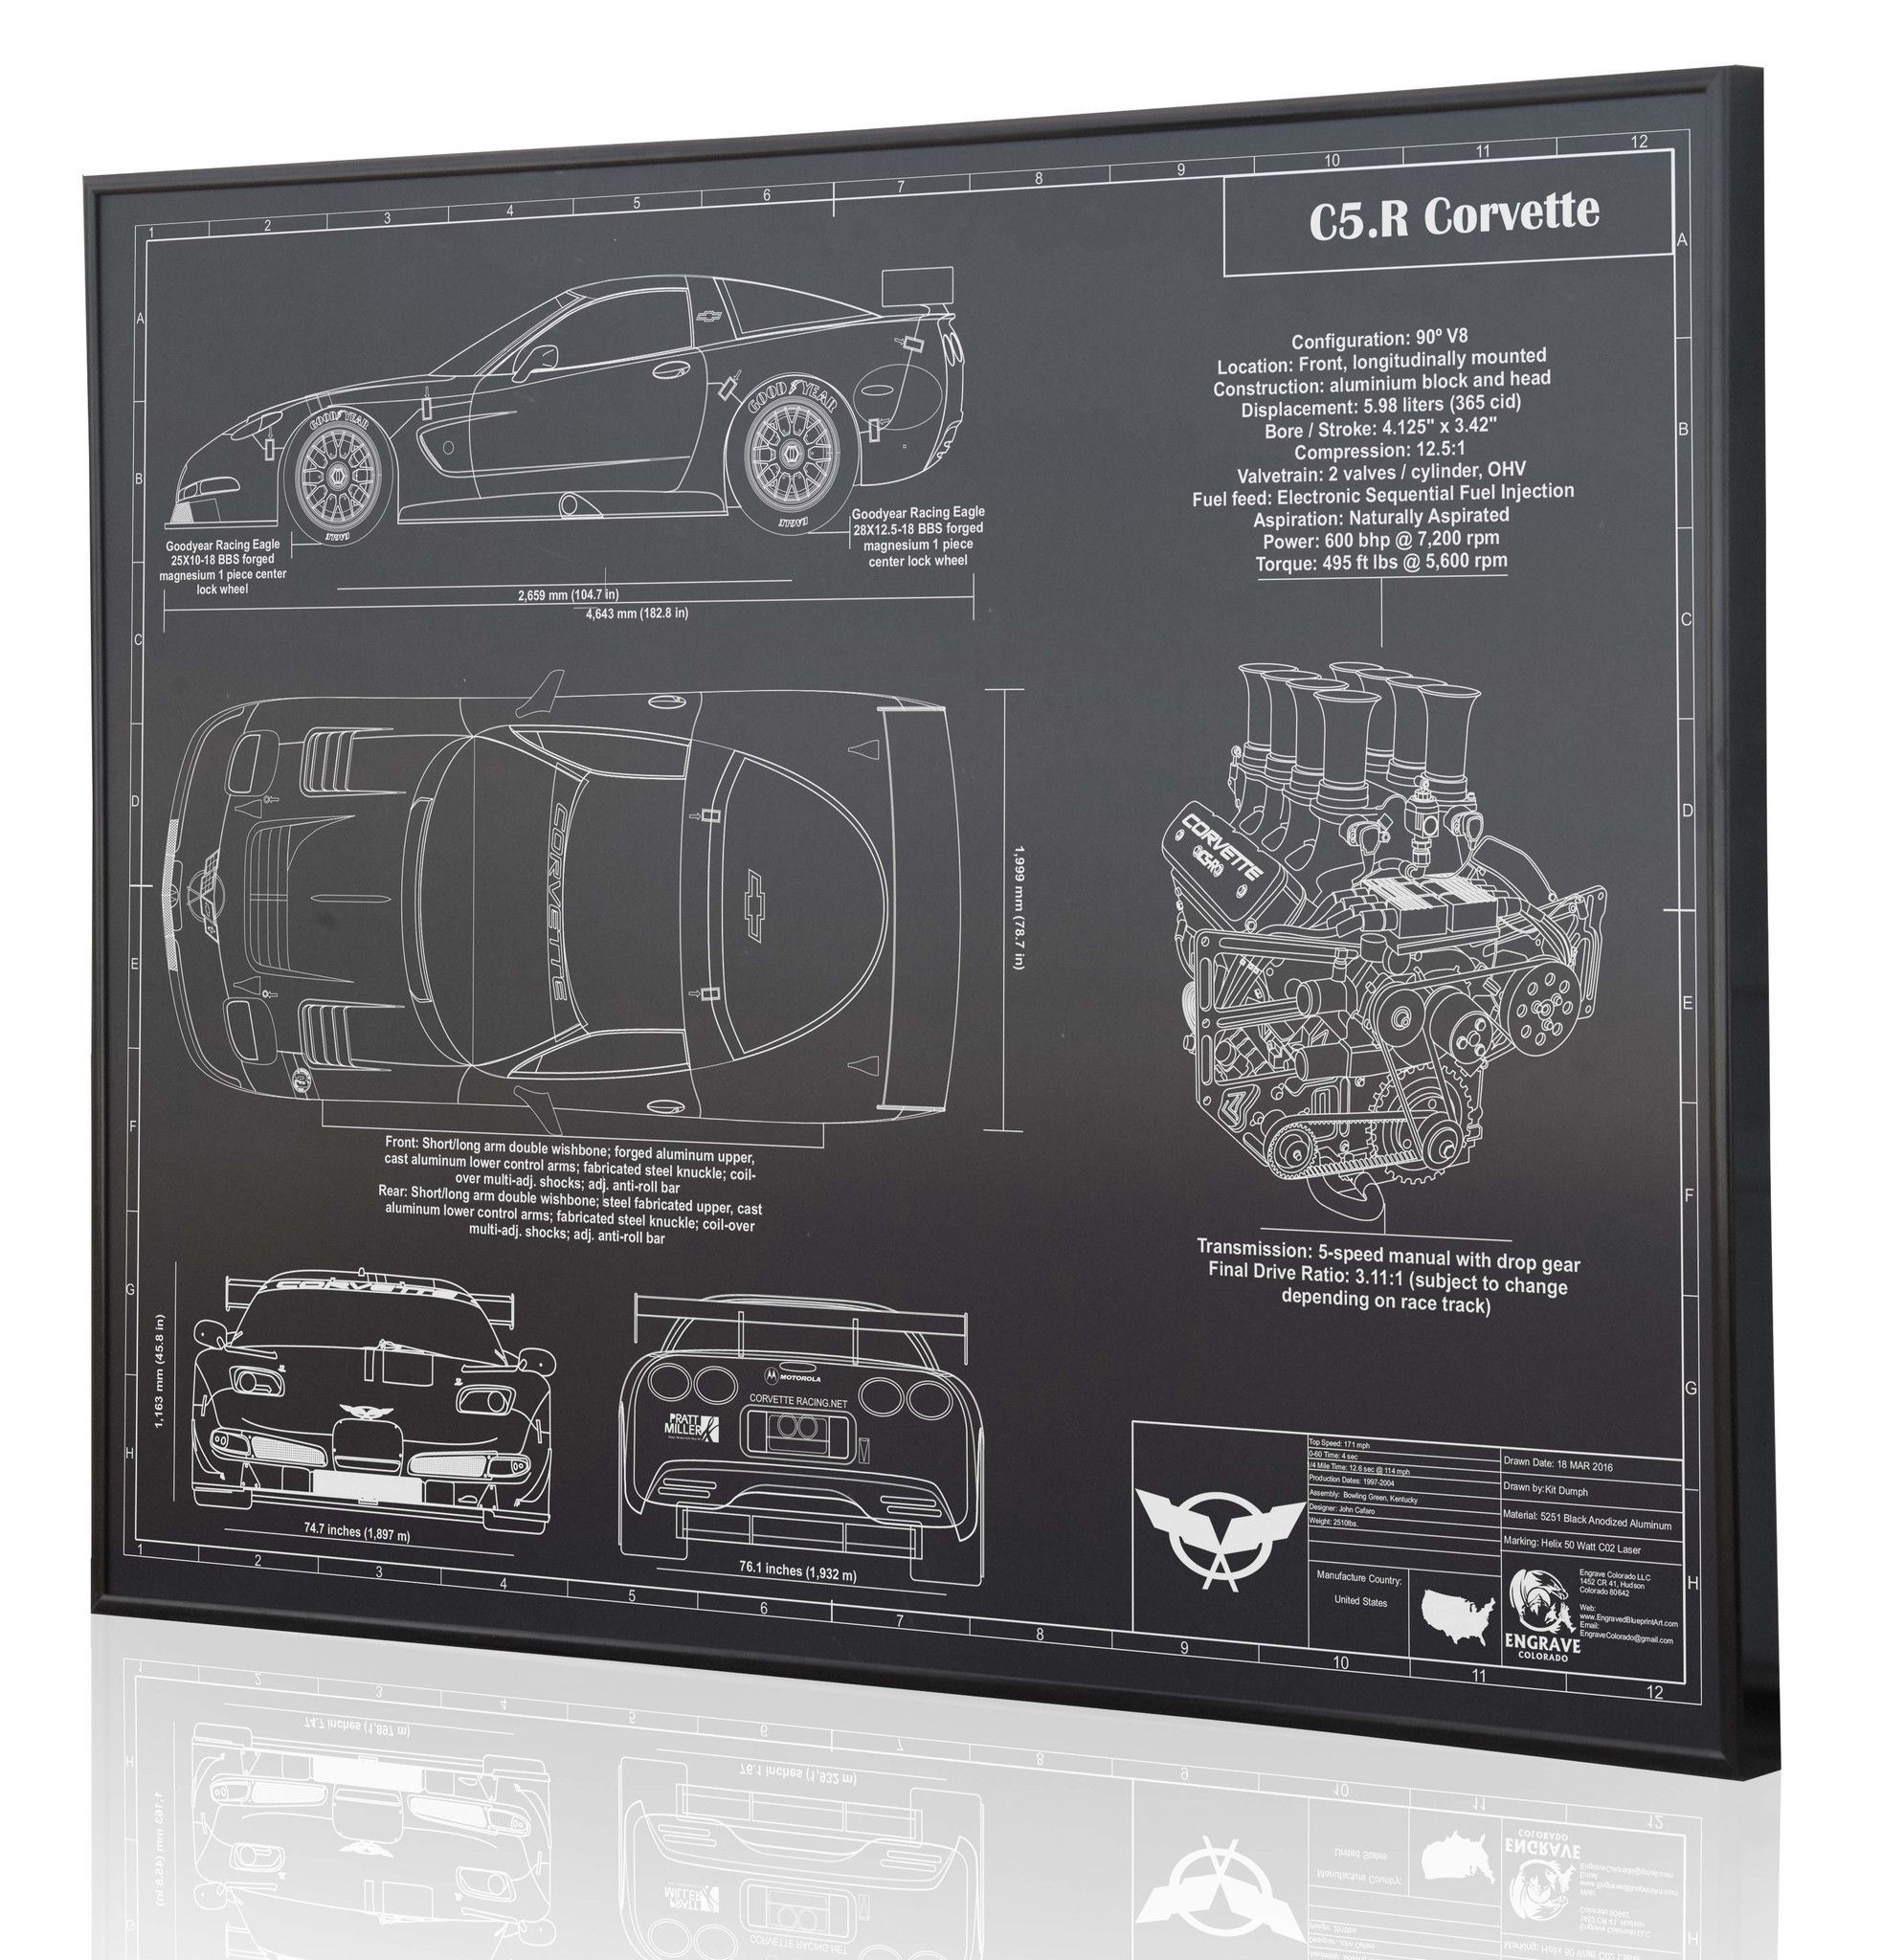 c7 corvette fuse box cover chevymall wiring diagrams 2002 corvette fuse box diagram 2004 corvette fuse box location